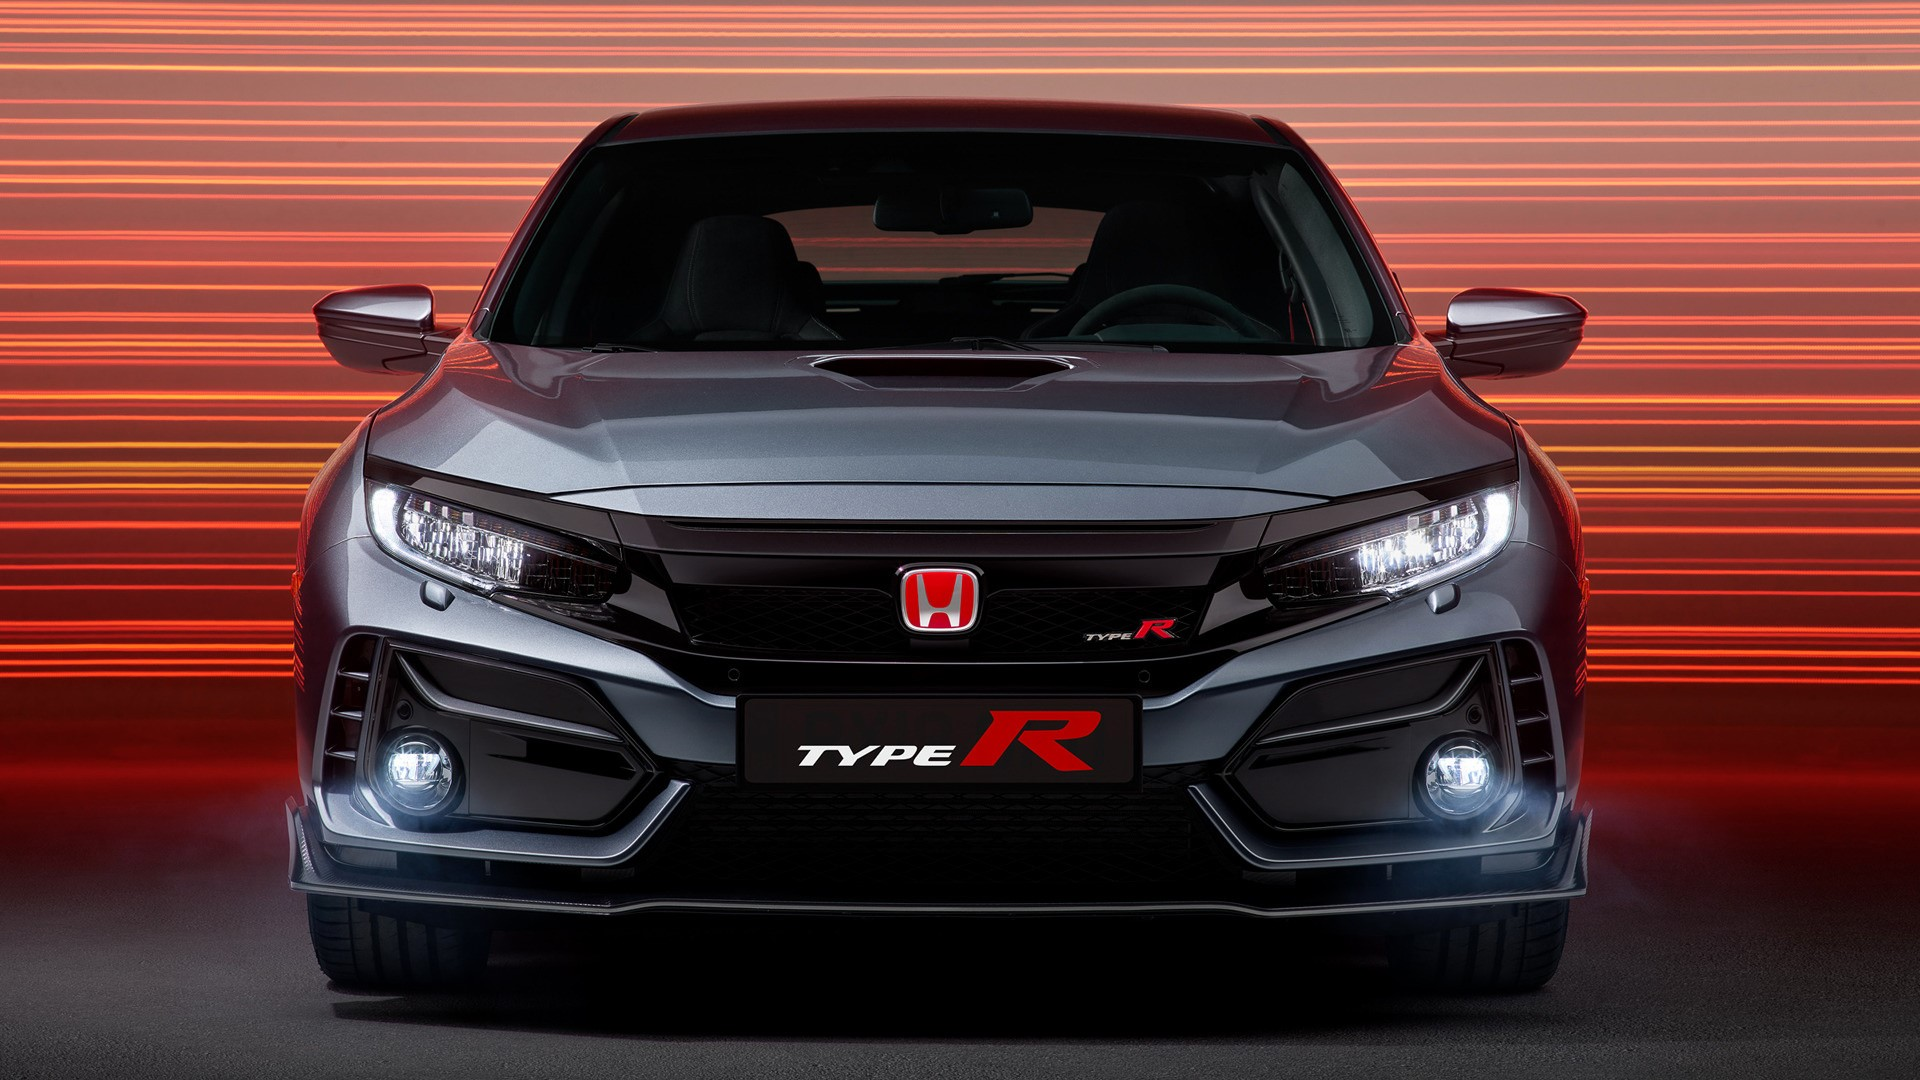 2020 Honda Type R 4K Wallpaper